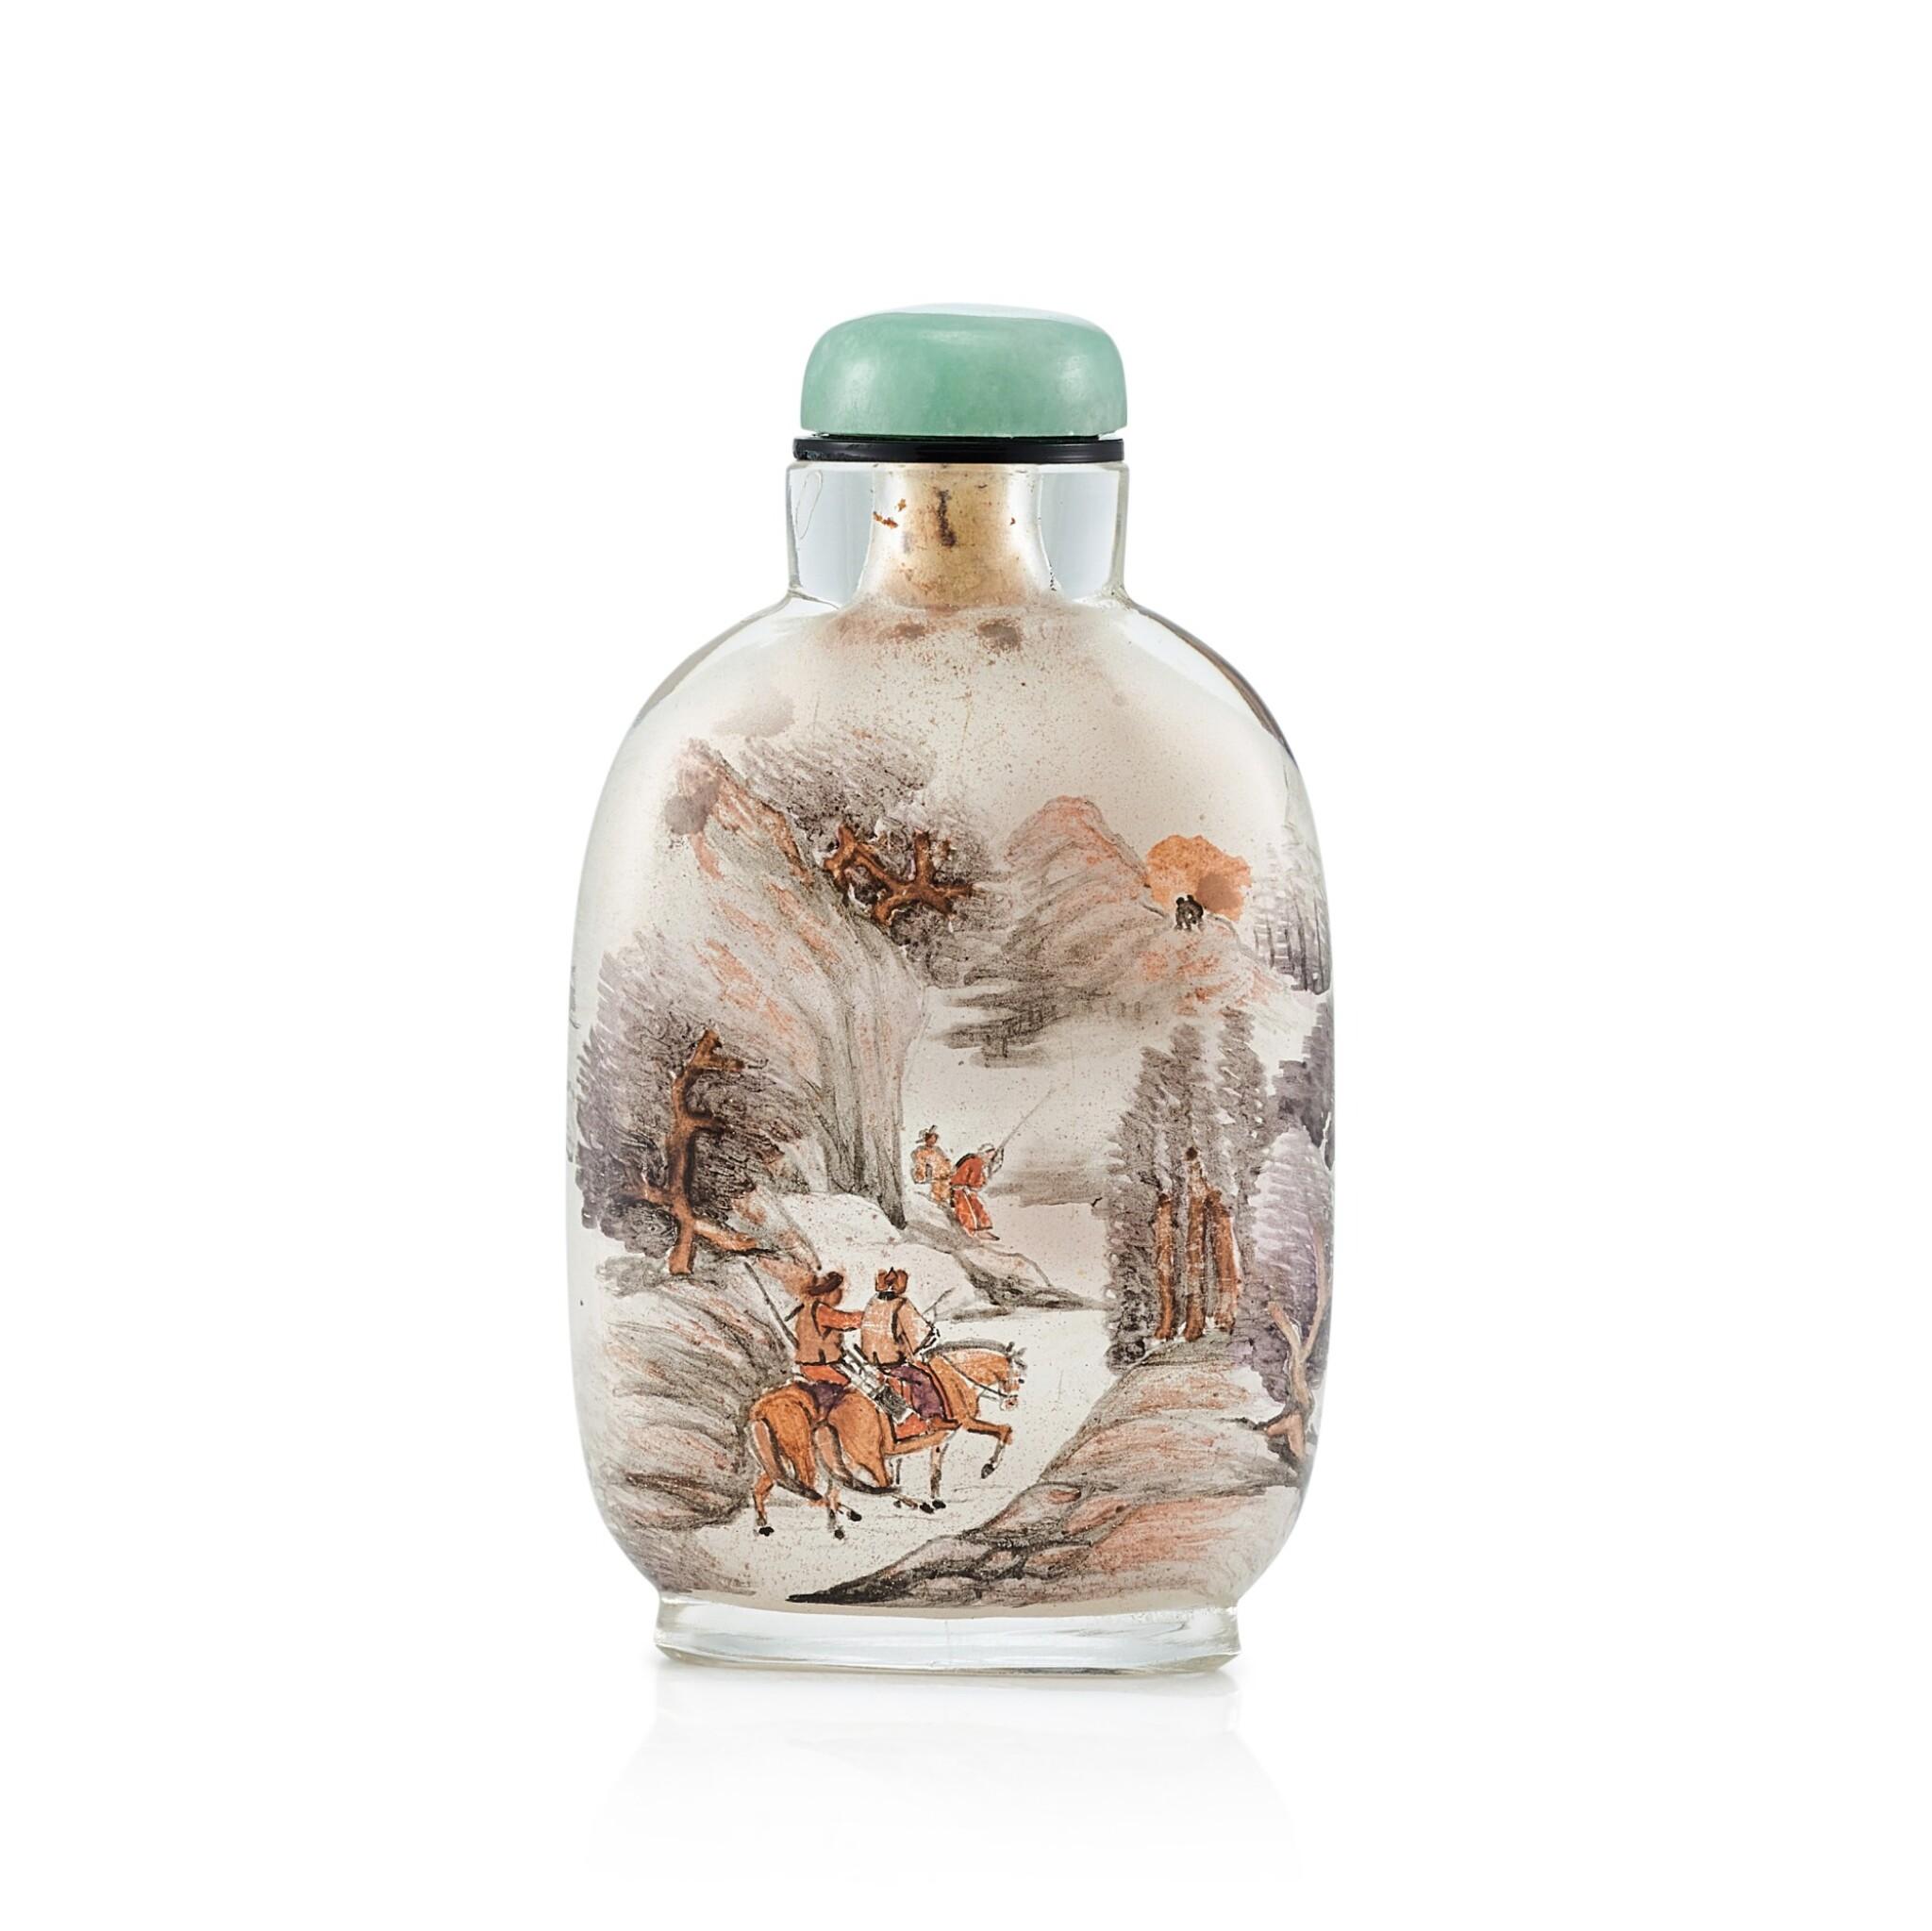 View full screen - View 1 of Lot 3056. An Inside-Painted Glass 'Equestrians in a Landscape' Snuff Bottle By Zhang Baotian, Dated Wuxu Year, Corresponding to 1898 | 戊戌(1898年) 張葆田作玻璃內畫狩獵圖鼻煙壺 《戊戌秋月張葆田作》款.